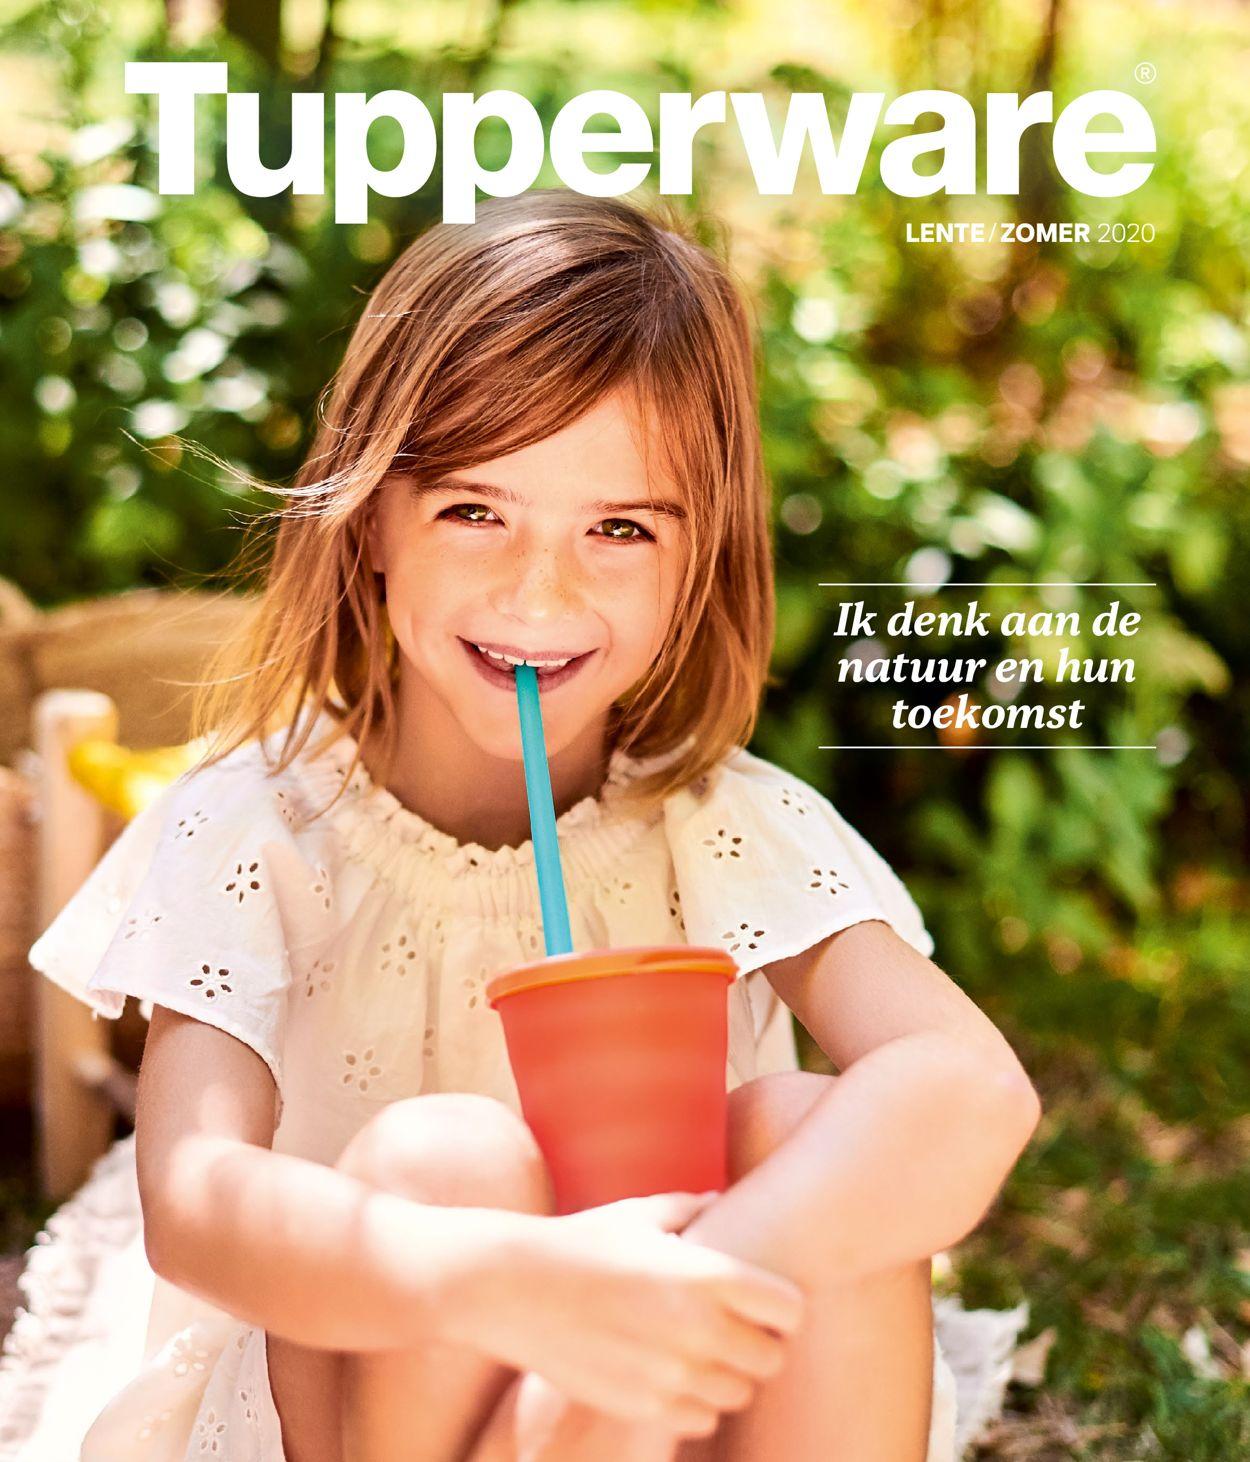 Catalogus van Tupperware van 18.08.2020